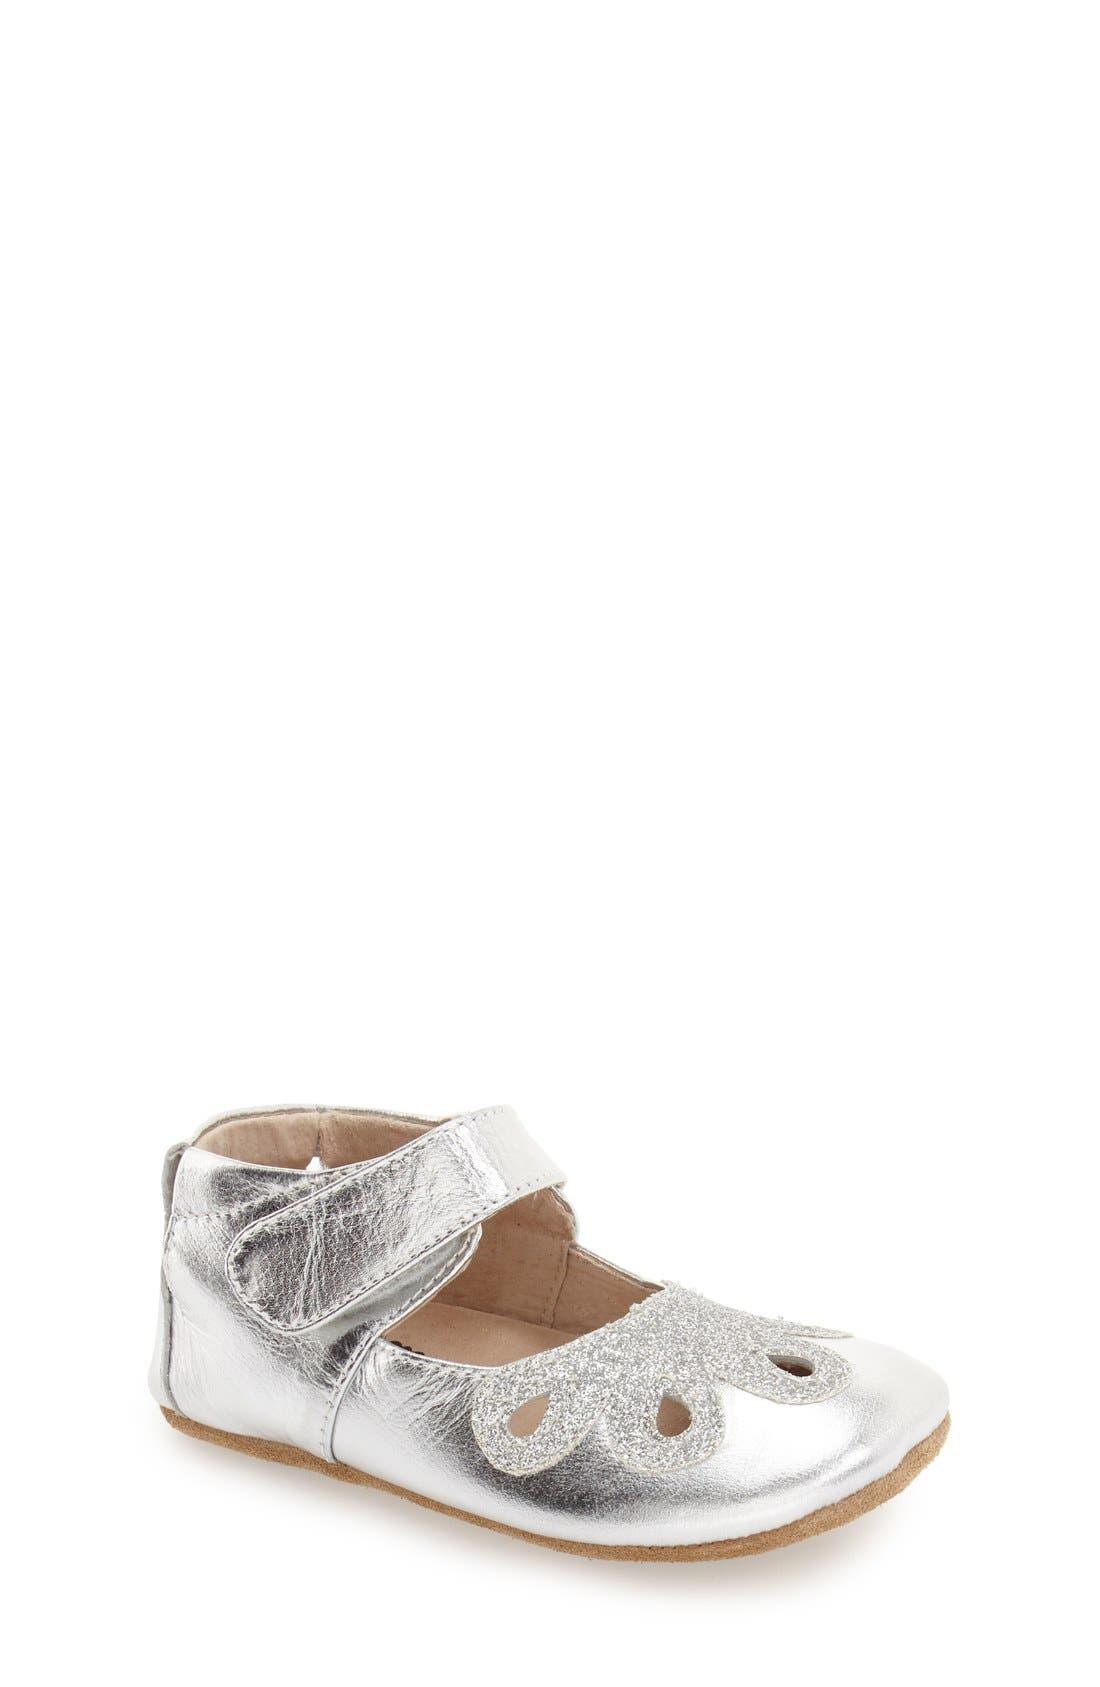 'Petal' Mary Jane Crib Shoe,                         Main,                         color, Platinum